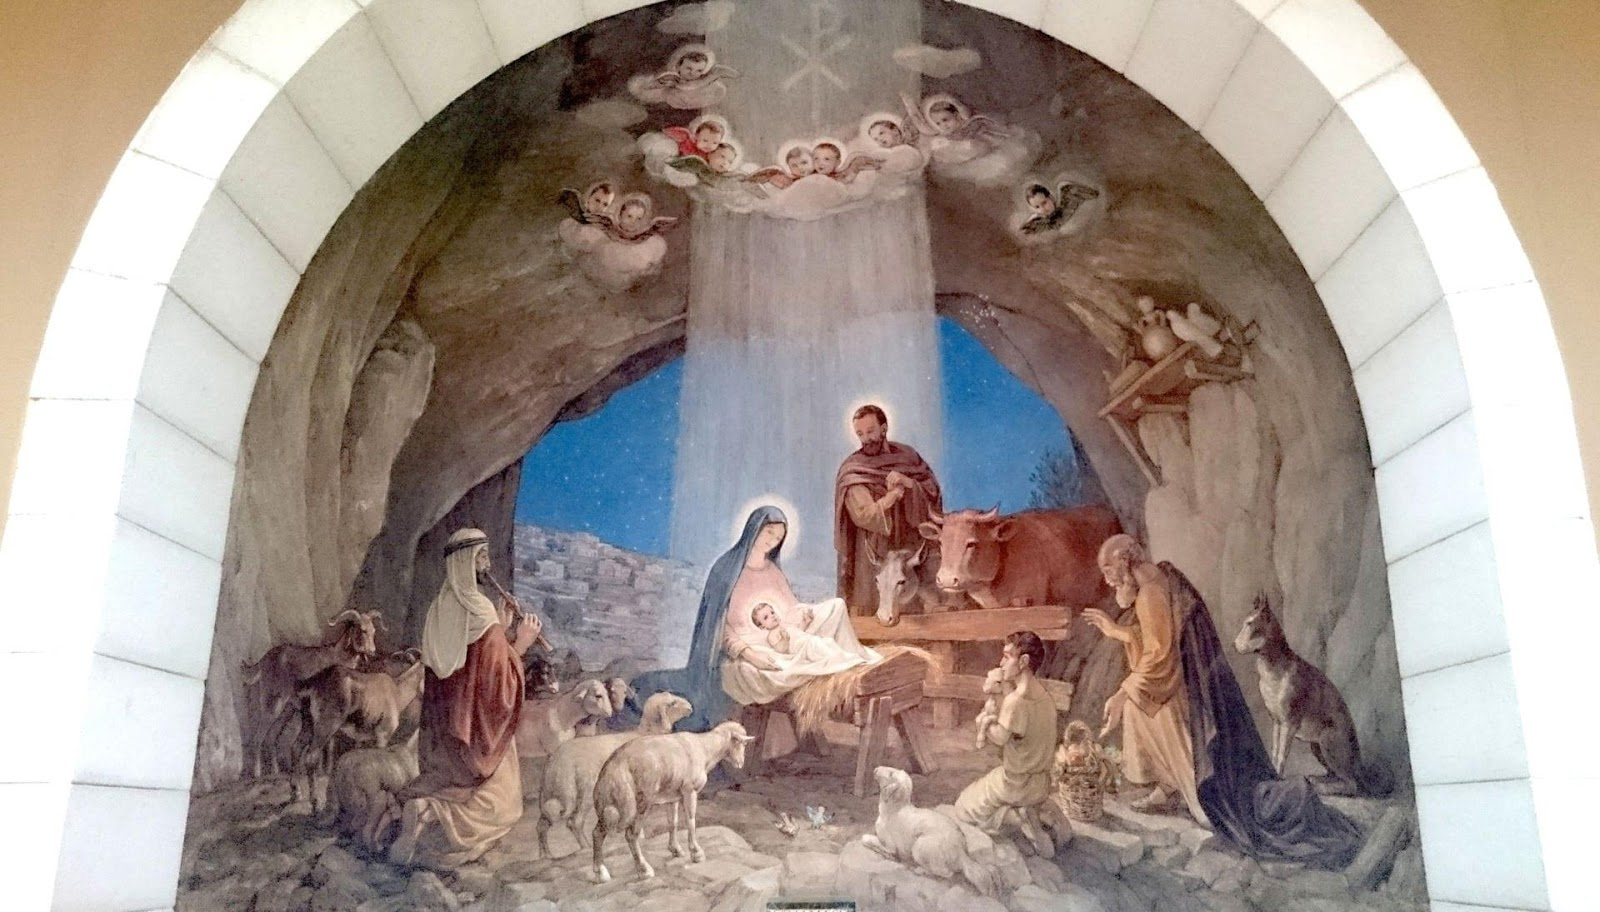 https://www.nguoi-viet.com/wp-content/uploads/2019/12/DL-Bethlehem-noi-Chua-Giang-Sinh-3.jpg